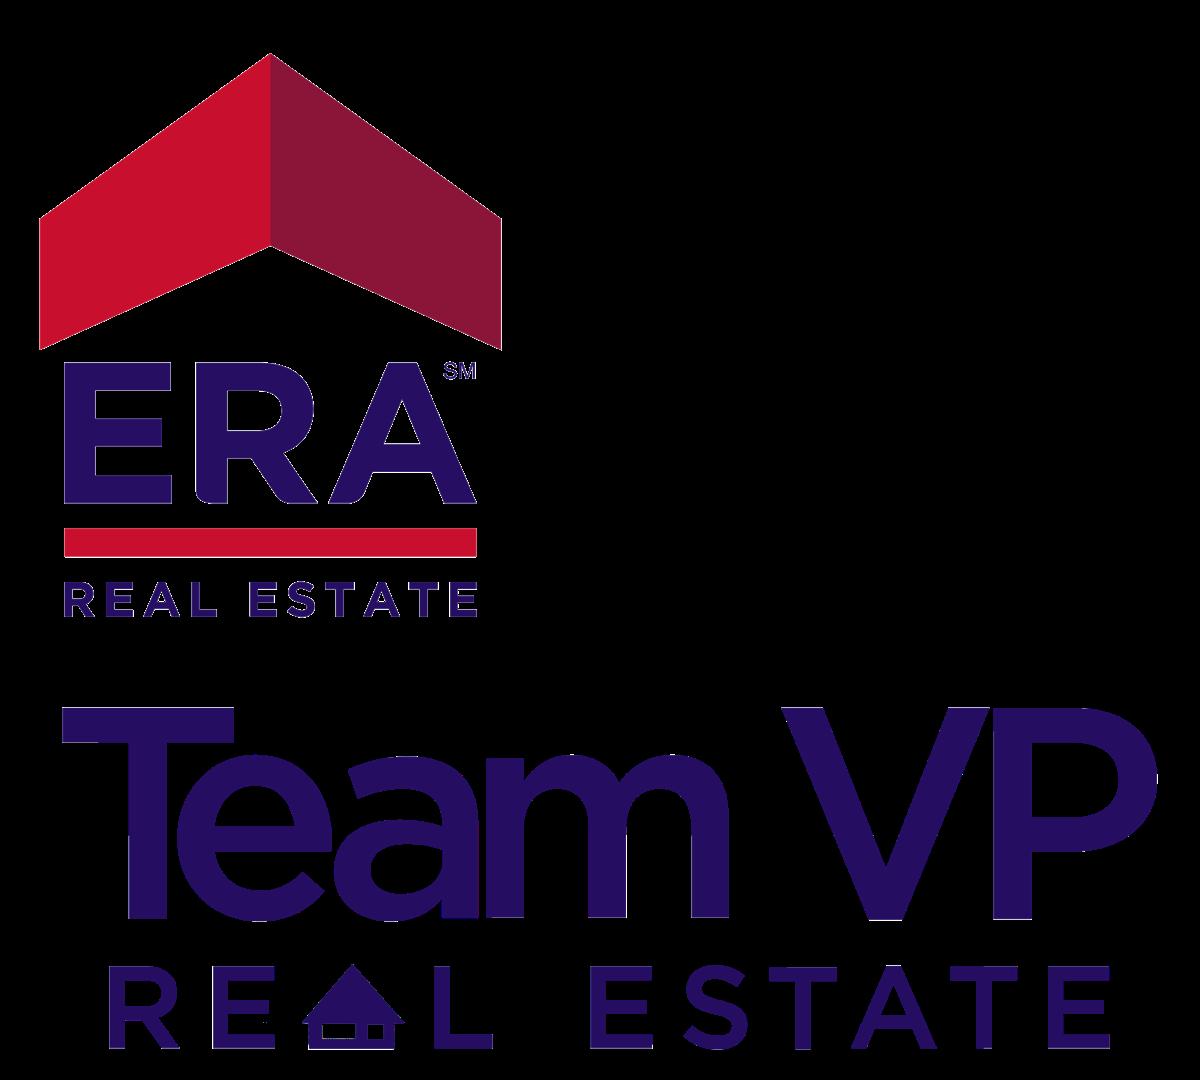 ERA Team VP Real Estate - Bradford Office